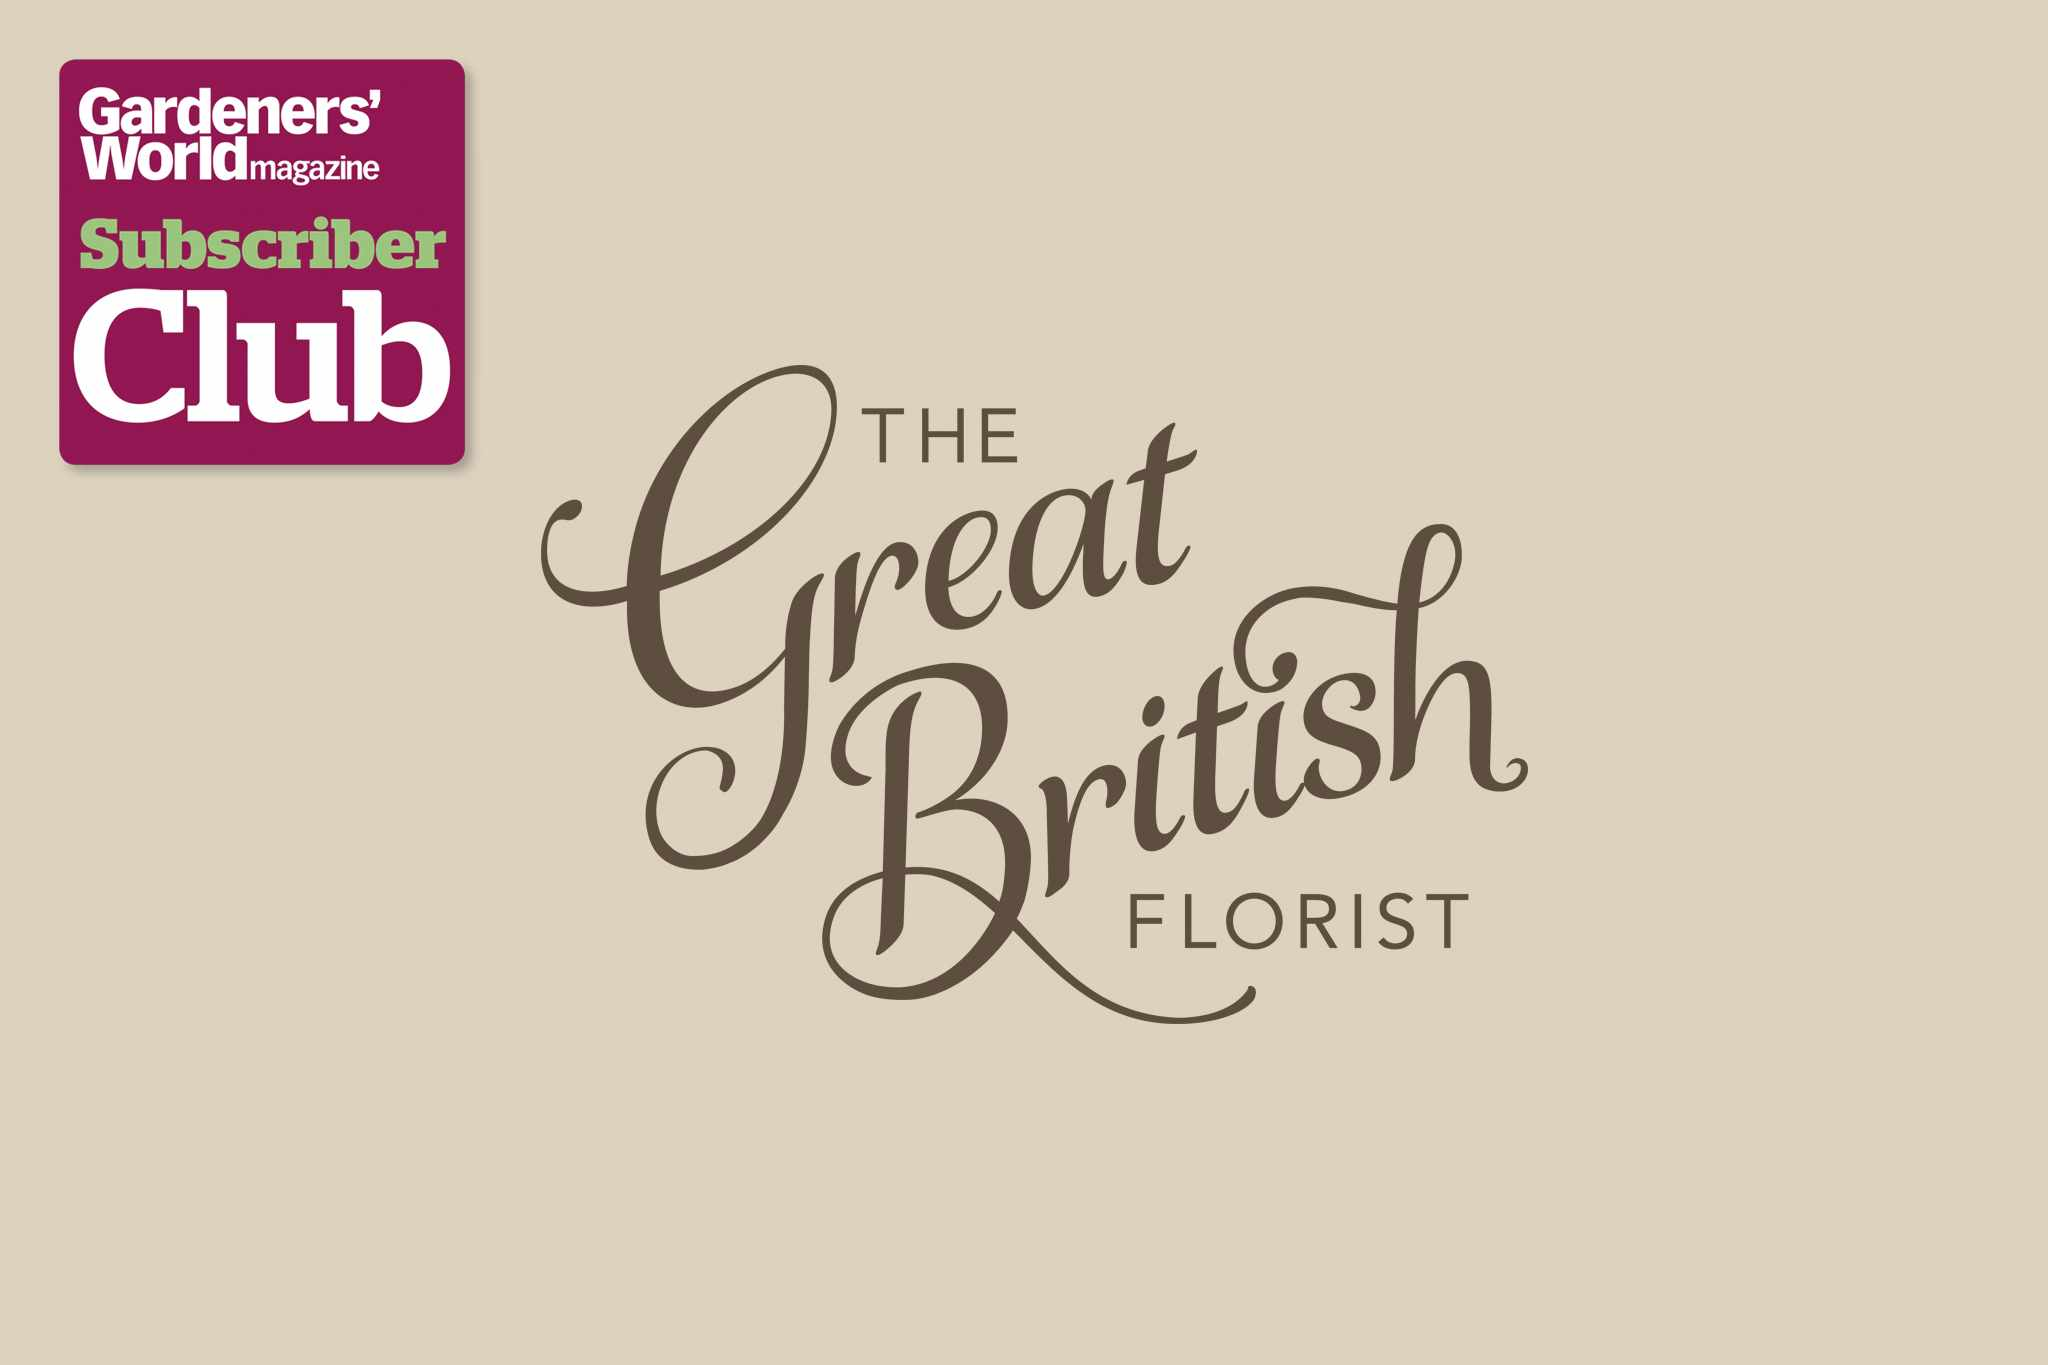 Great British Florist BBC Gardeners' World Magazine Subscriber Club discount